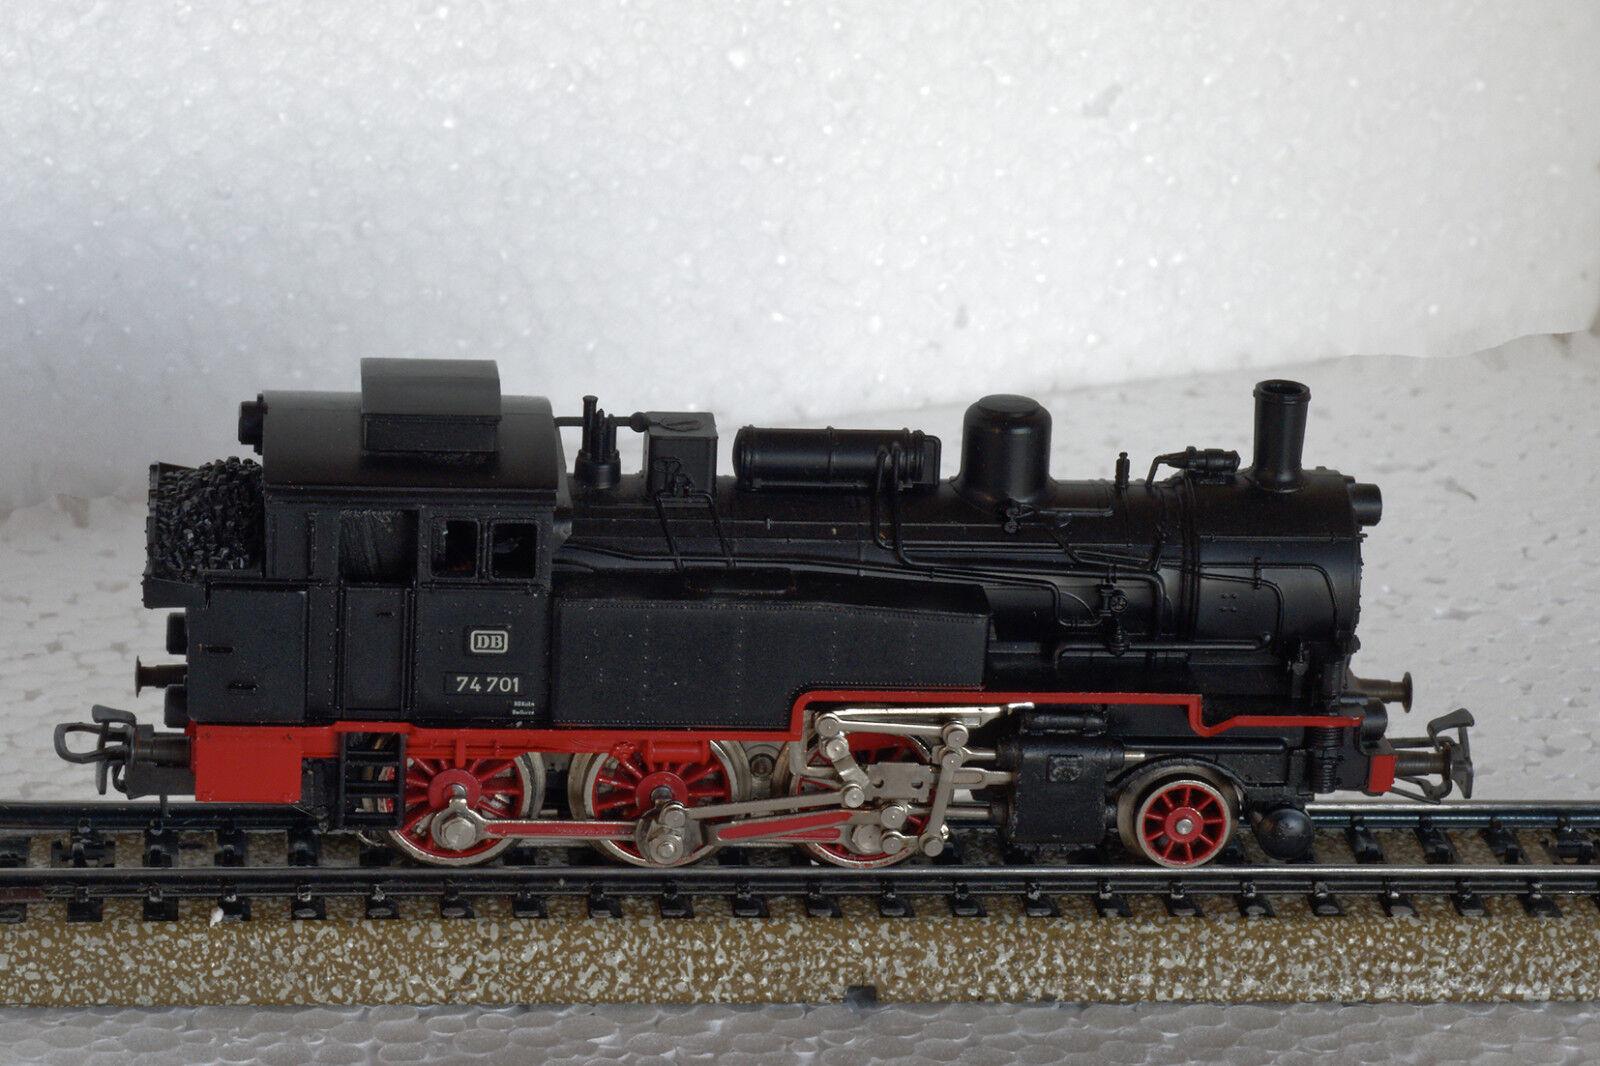 LOT 008 - MARKLIN MARKLIN MARKLIN HO - locomotive vapeur type 130 - BR 74 - réf 3095 8b1847